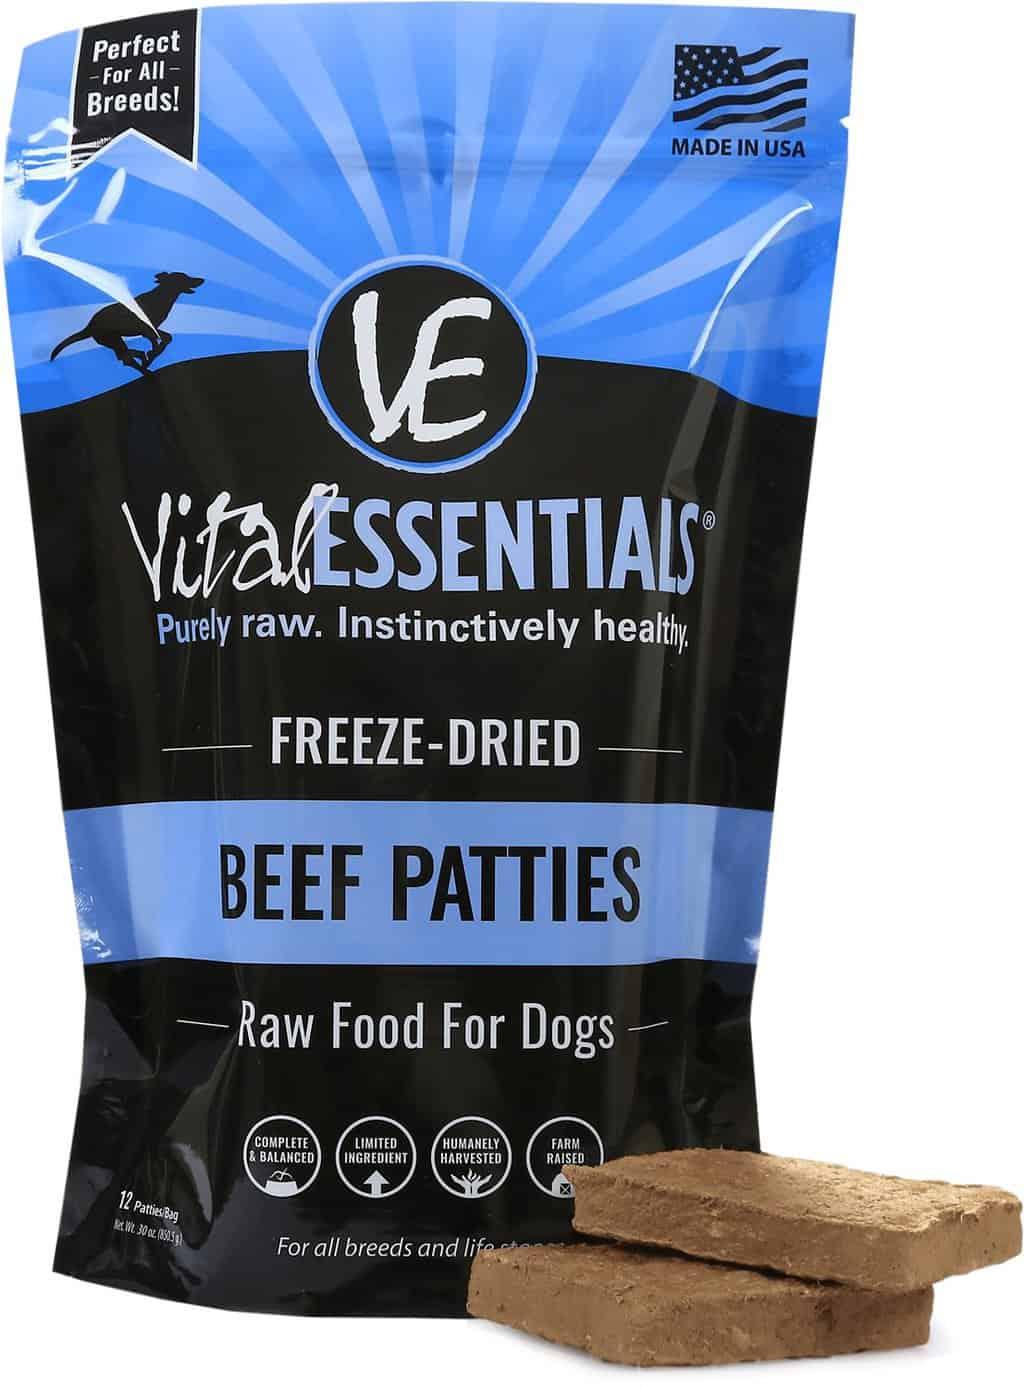 Vital Essentials Dog Food: [year] Reviews, Recalls & Coupons 17